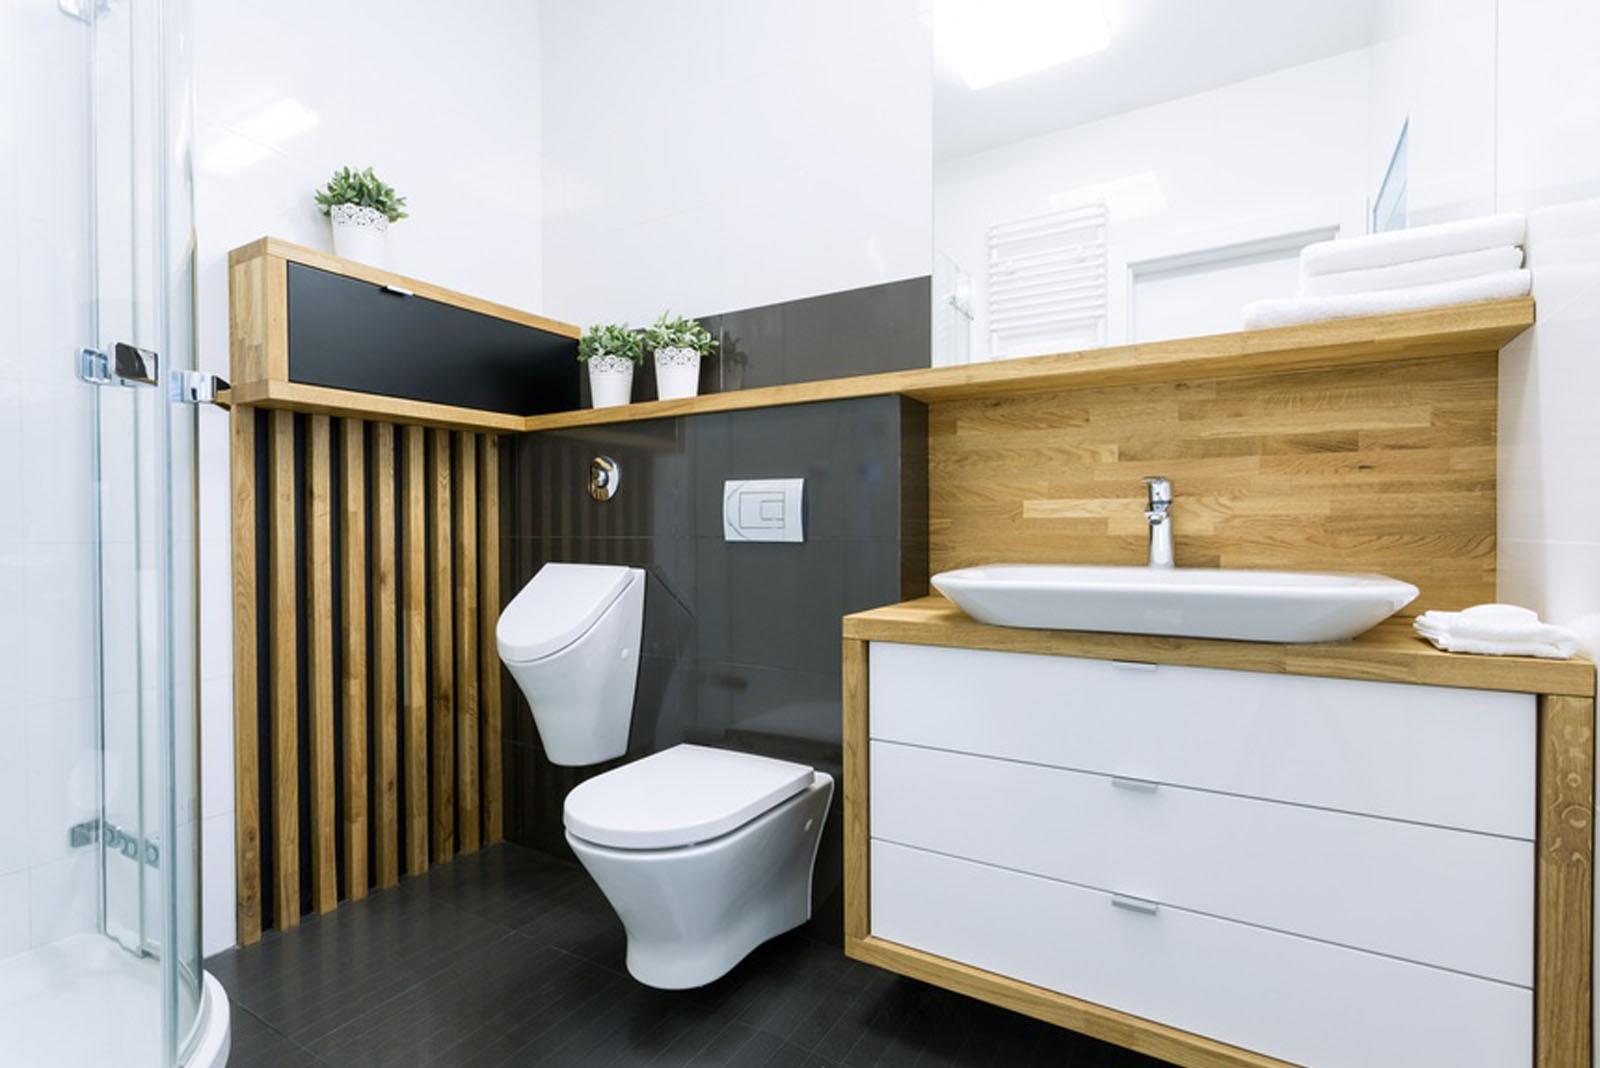 Bathroom design Kincir Bali WP 2